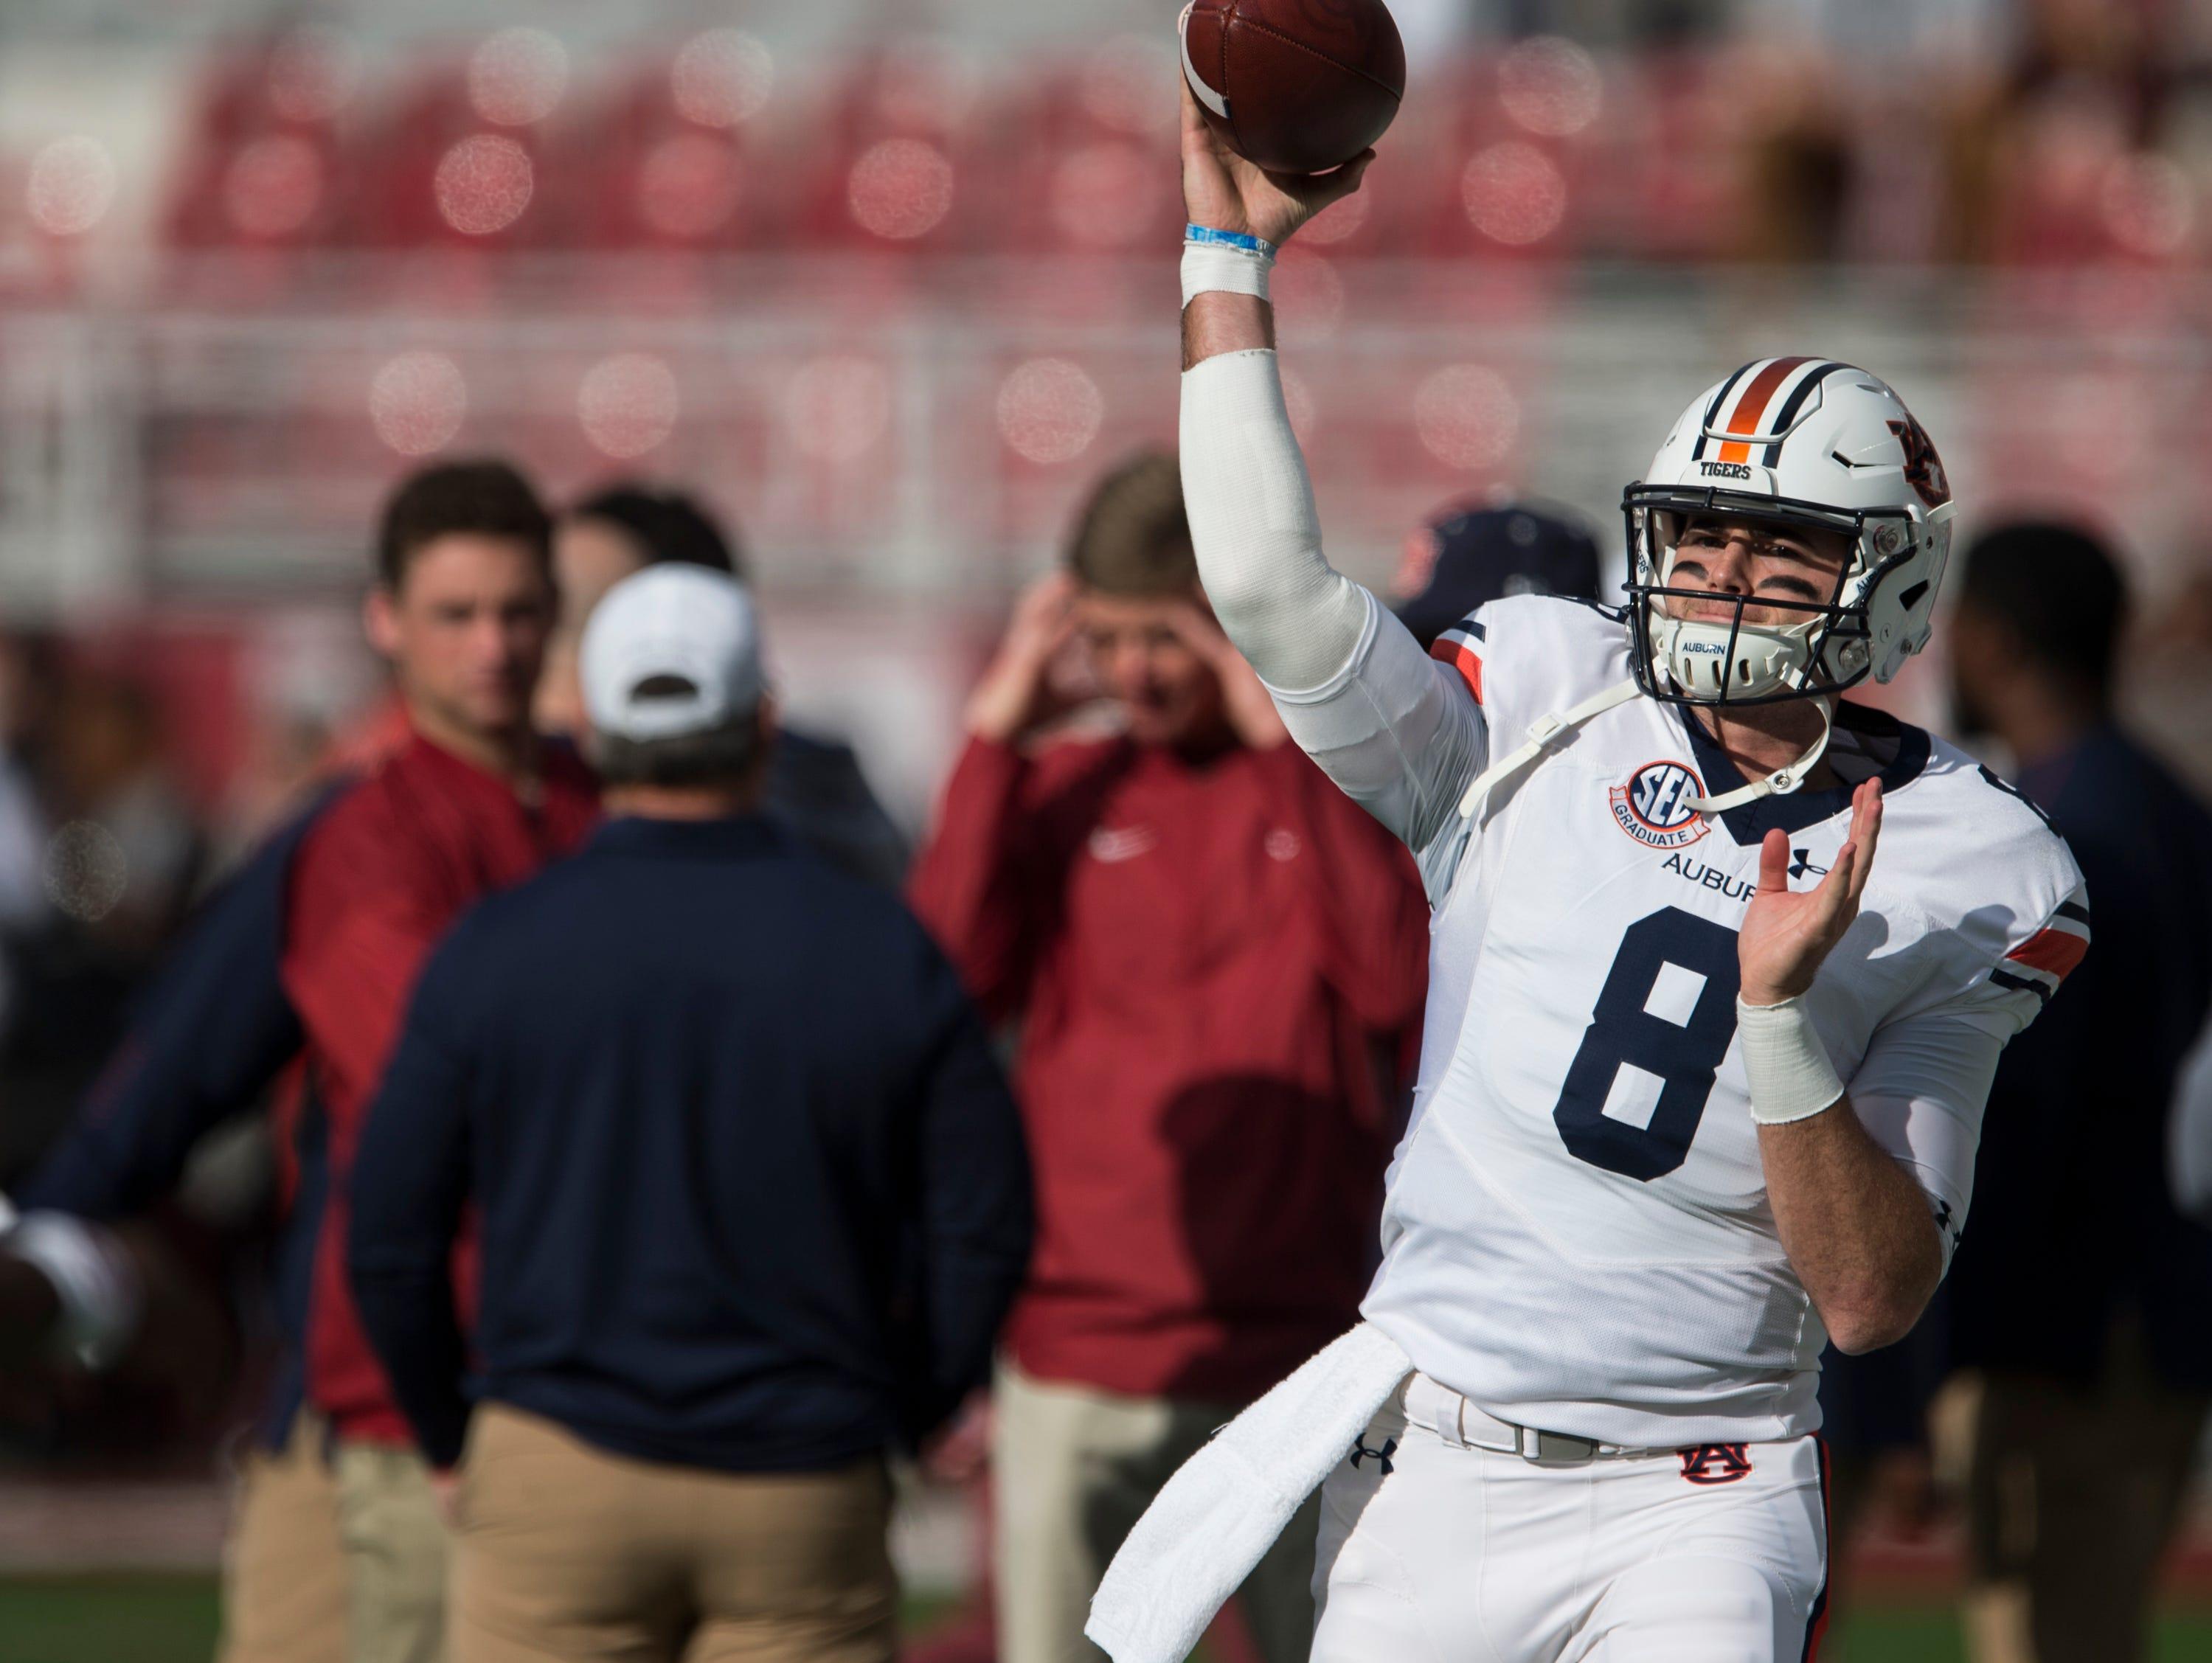 Auburn quarterback Jarrett Stidham (8) warms up before the Iron Bowl at Bryant-Denny Stadium in Tuscaloosa, Ala., on Saturday, Nov. 24, 2018.